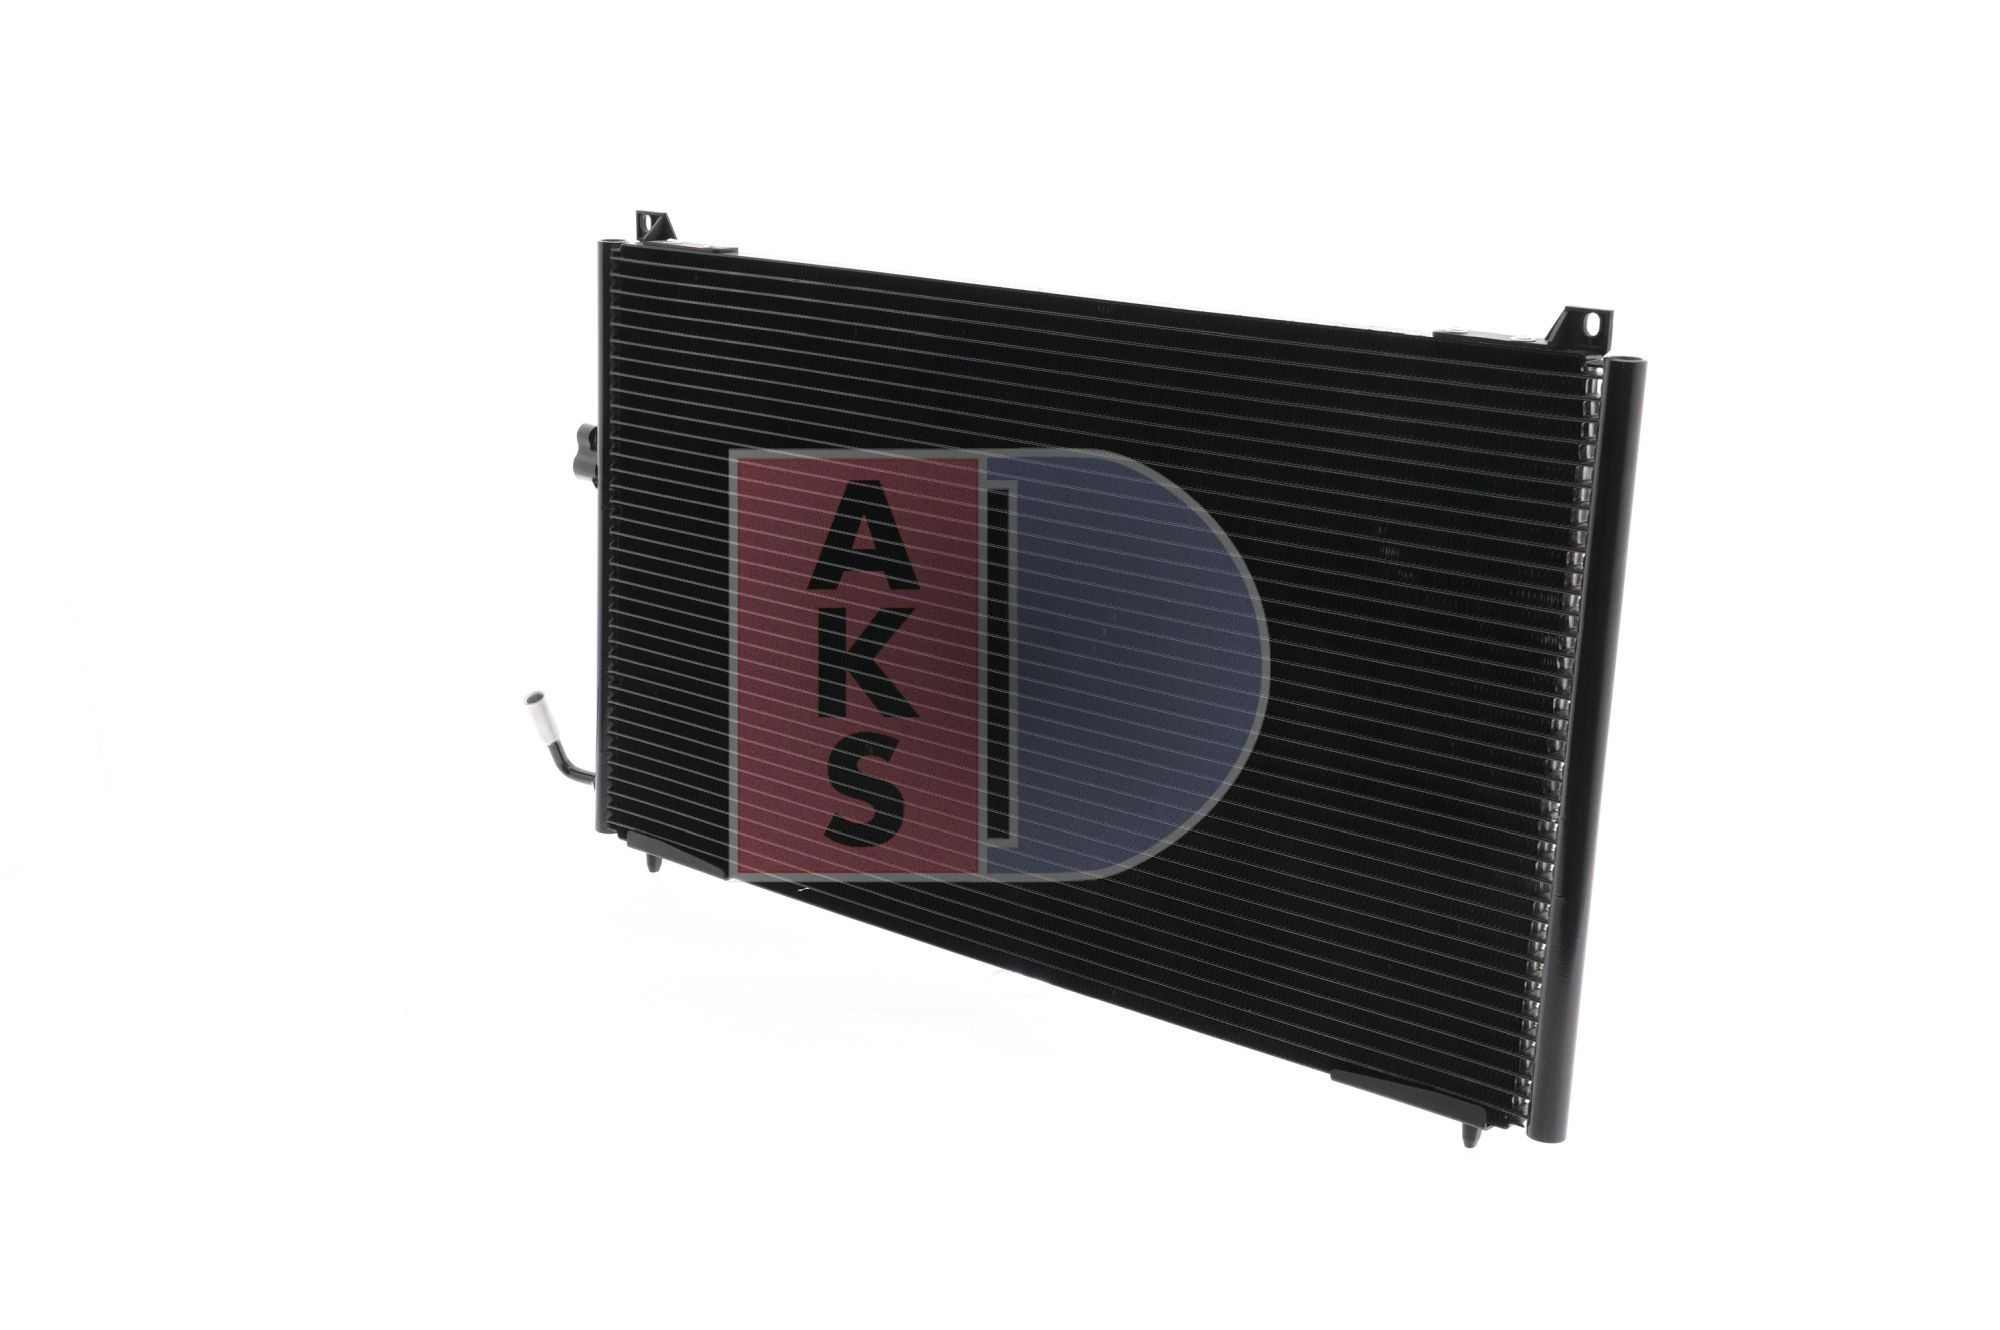 AKS DASIS  162300N Kondensator, Klimaanlage Netzmaße: 645x378x16